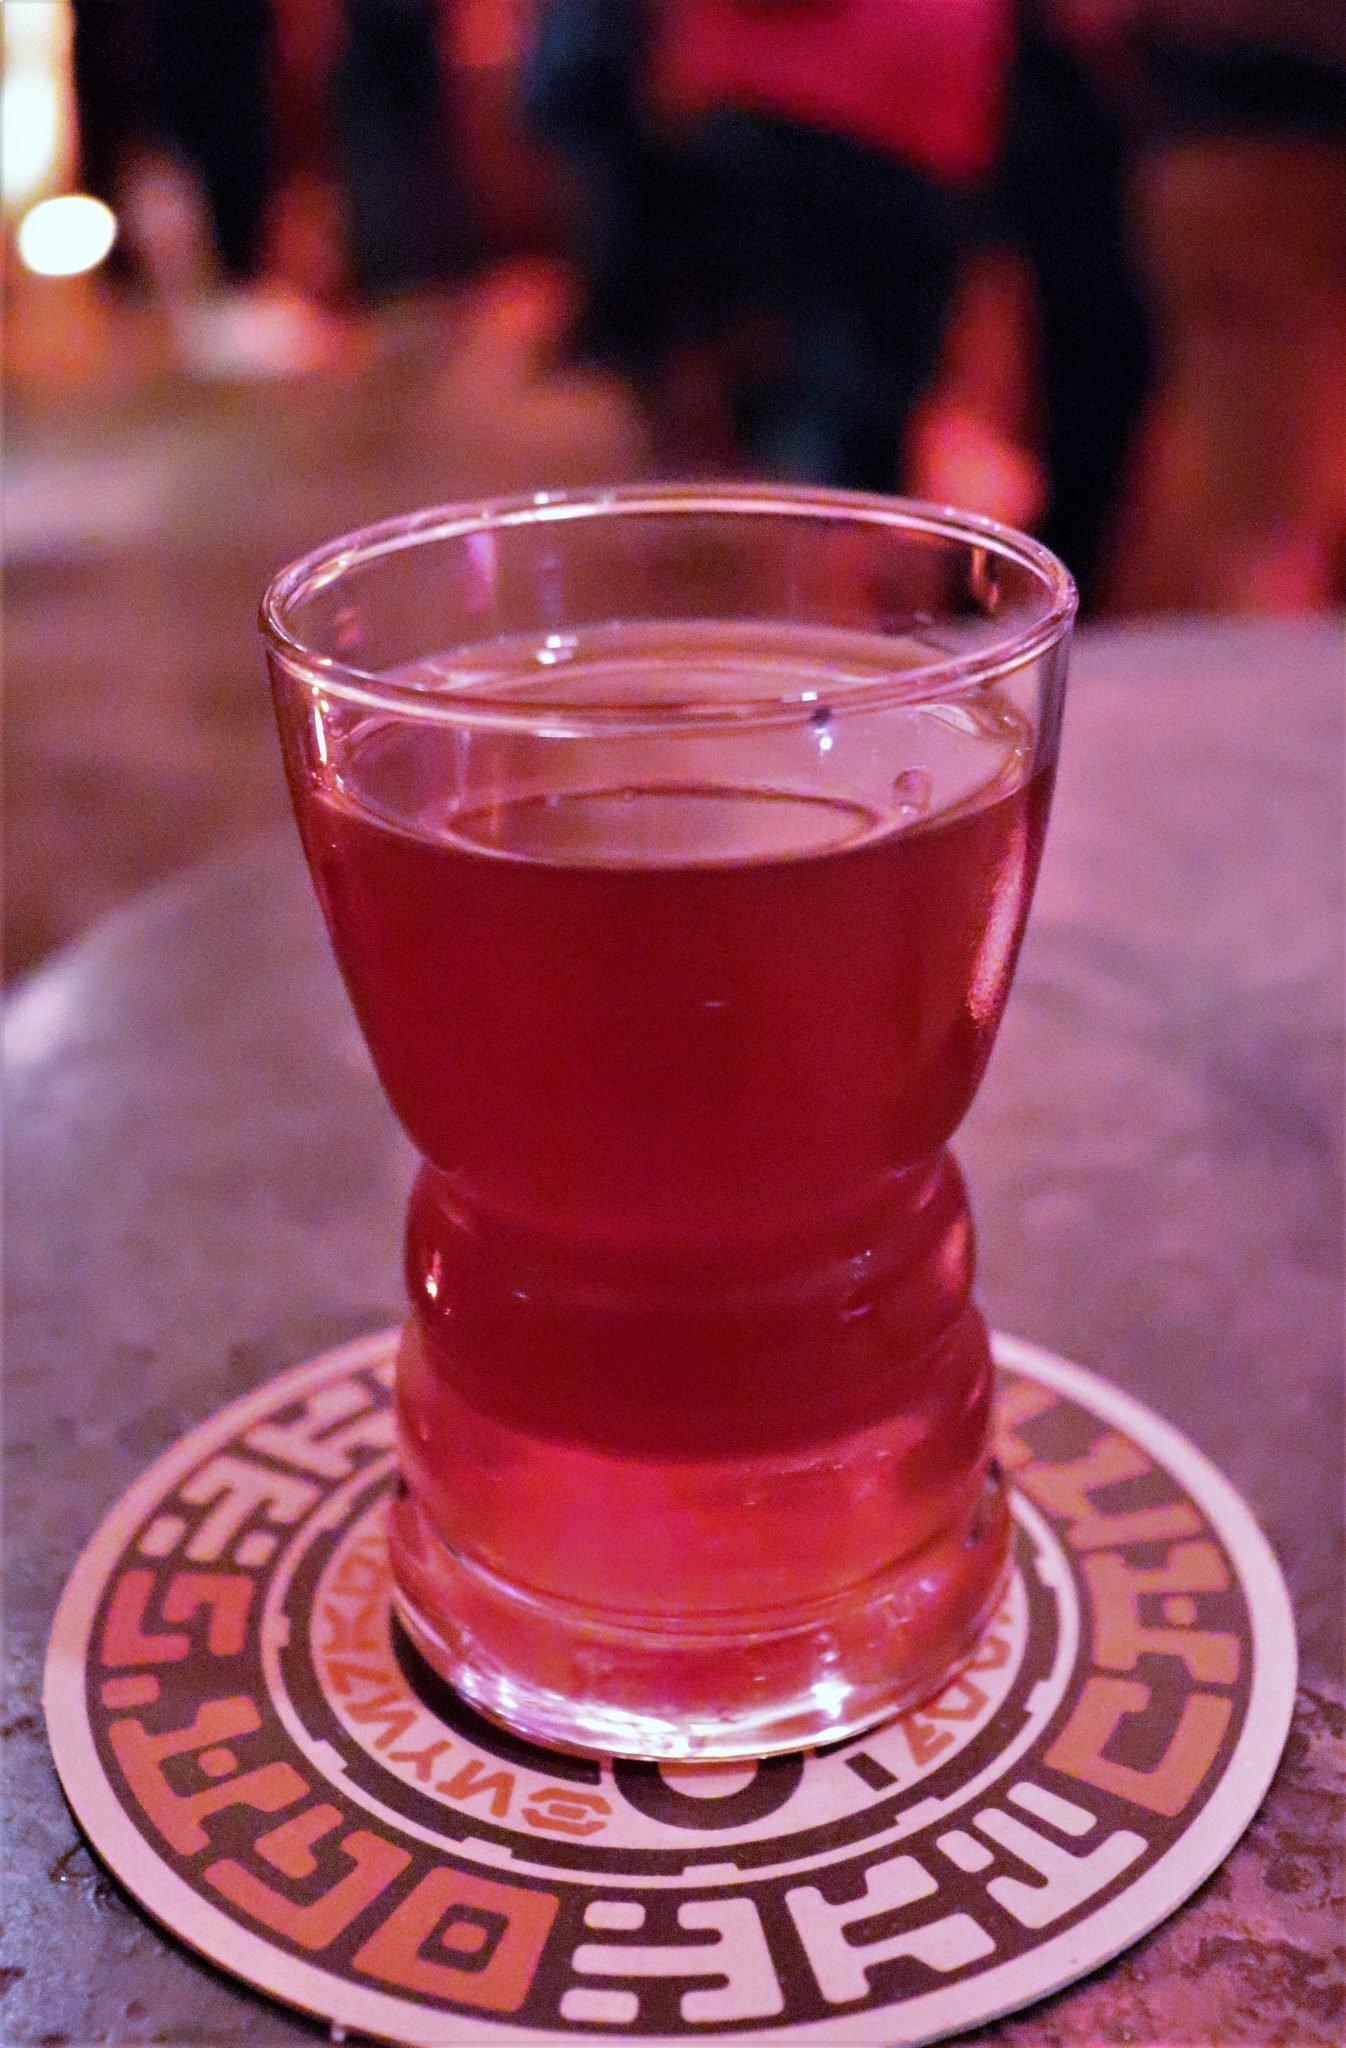 drinks at Oga's Cantina - Jet juice